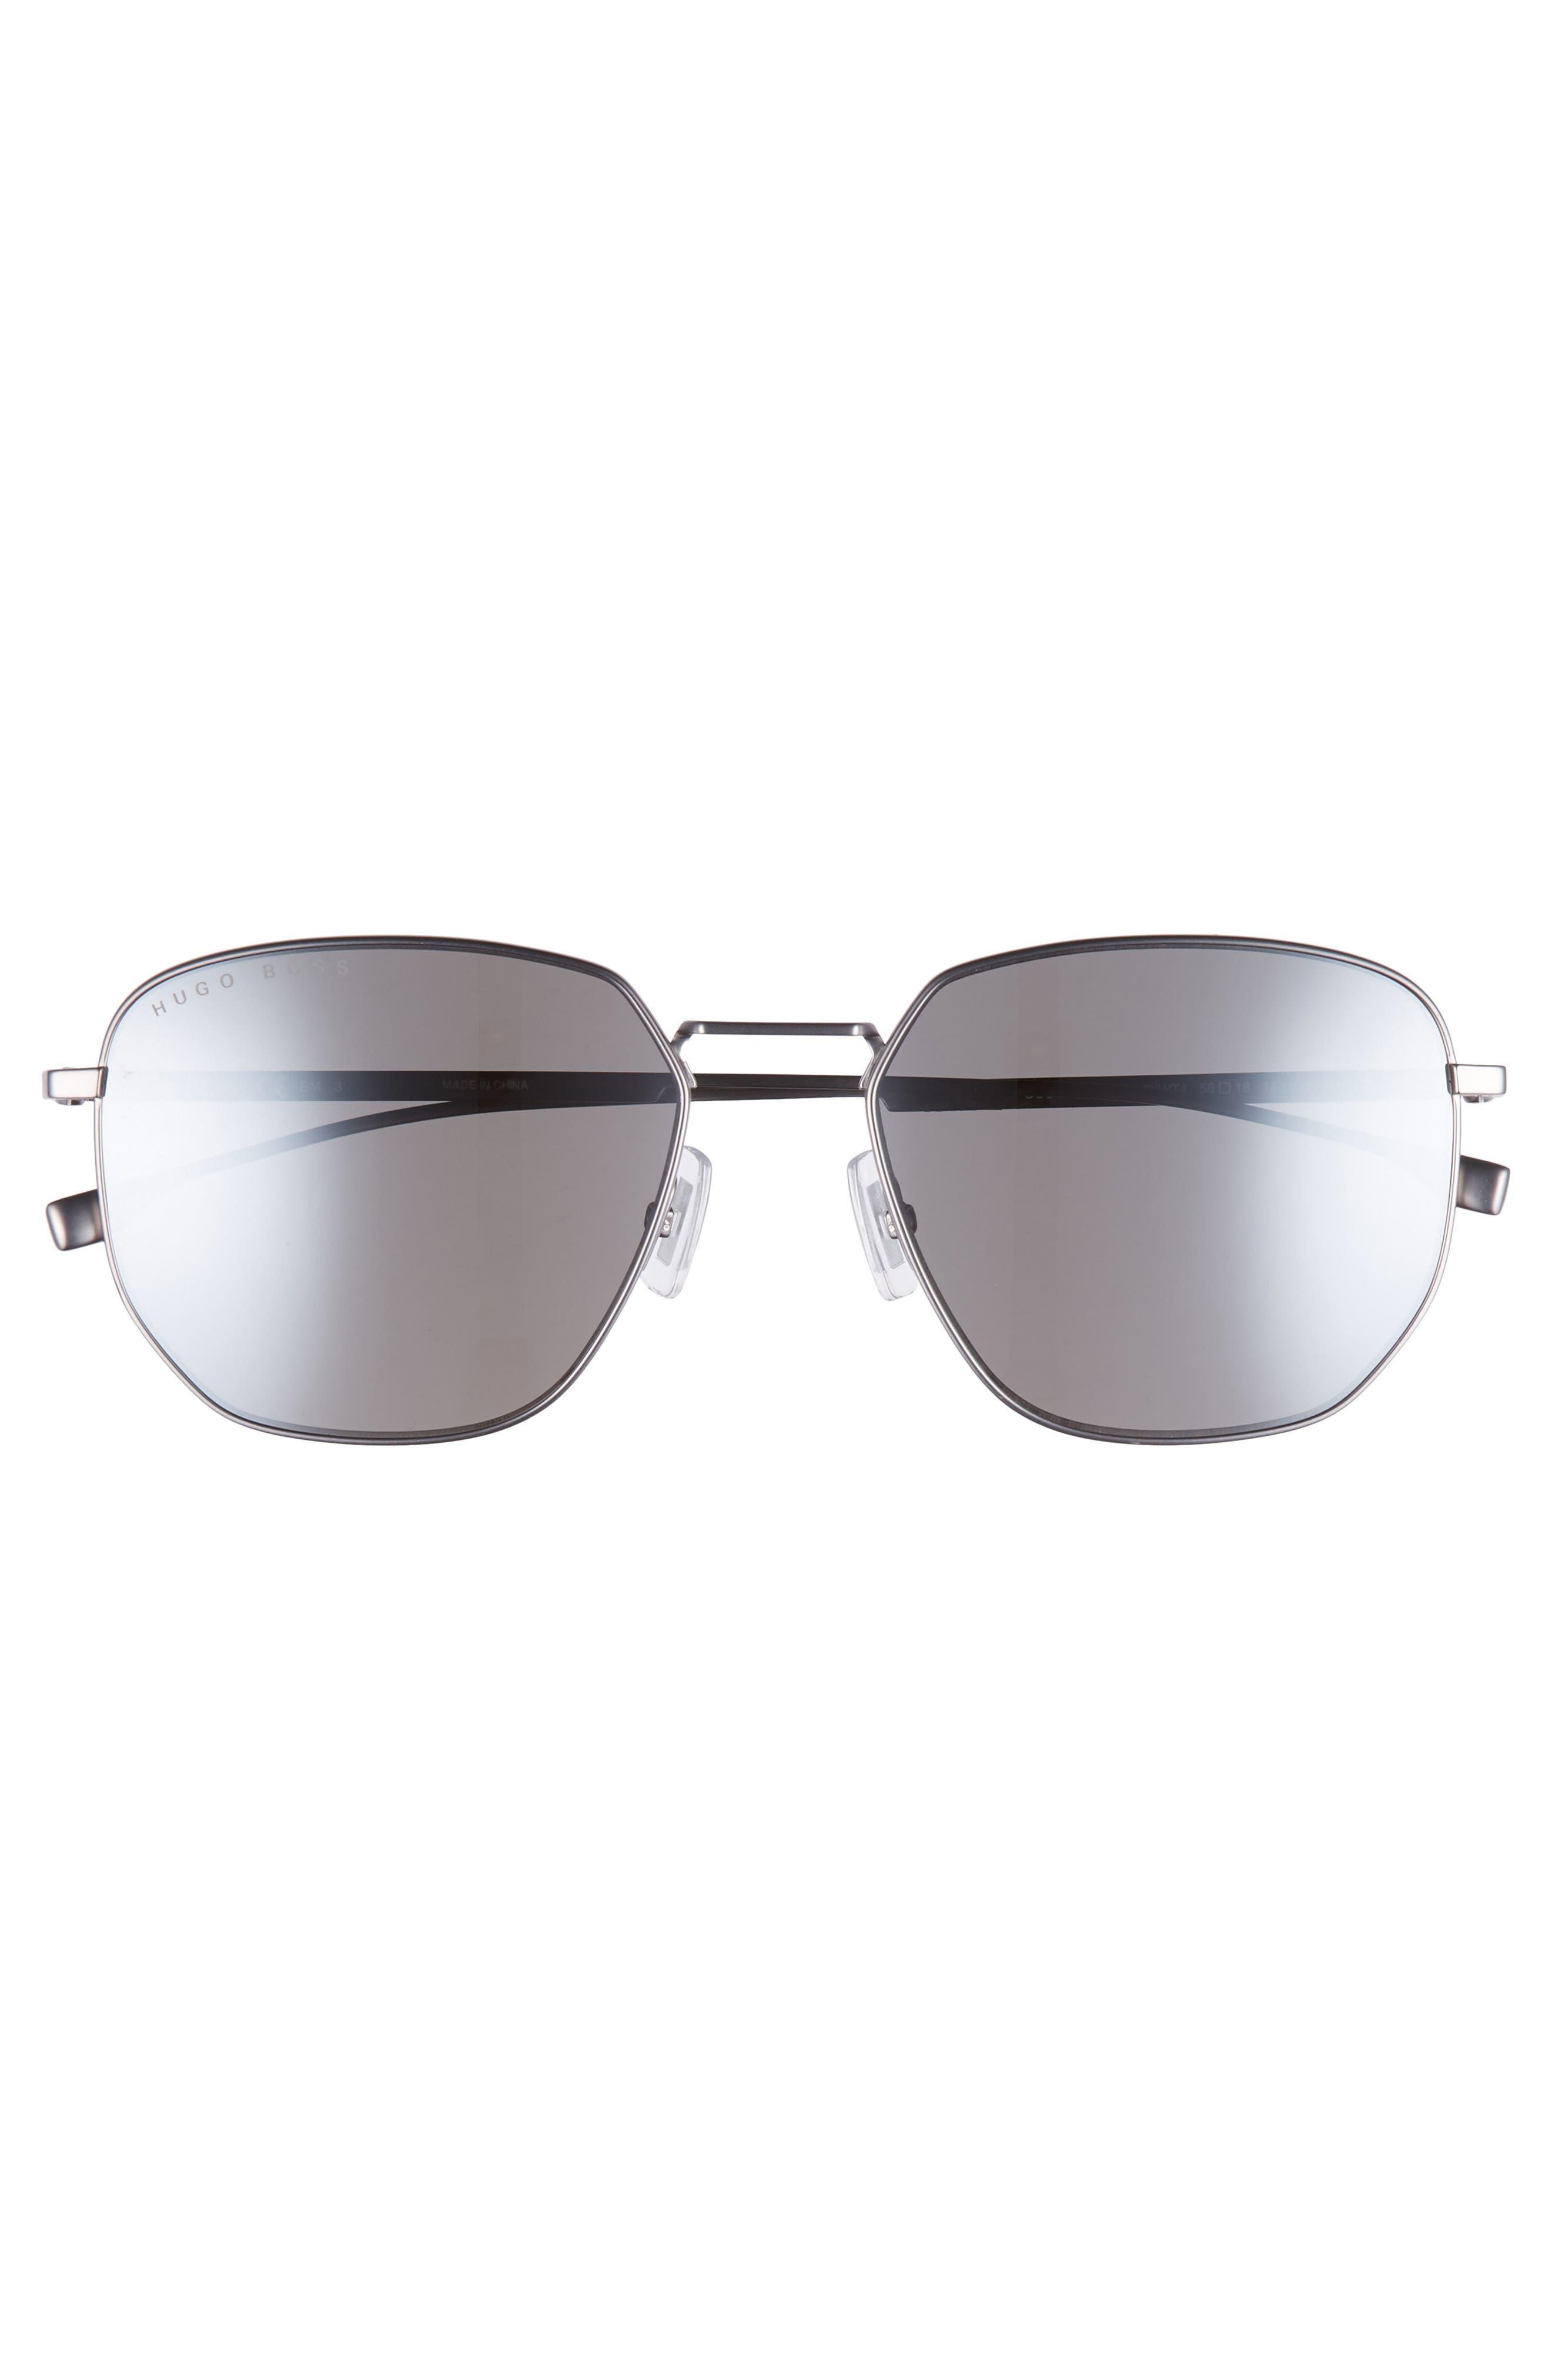 Special Fit 58mm Polarized Titanium Aviator Sunglasses,                             Alternate thumbnail 2, color,                             MATTE GREY